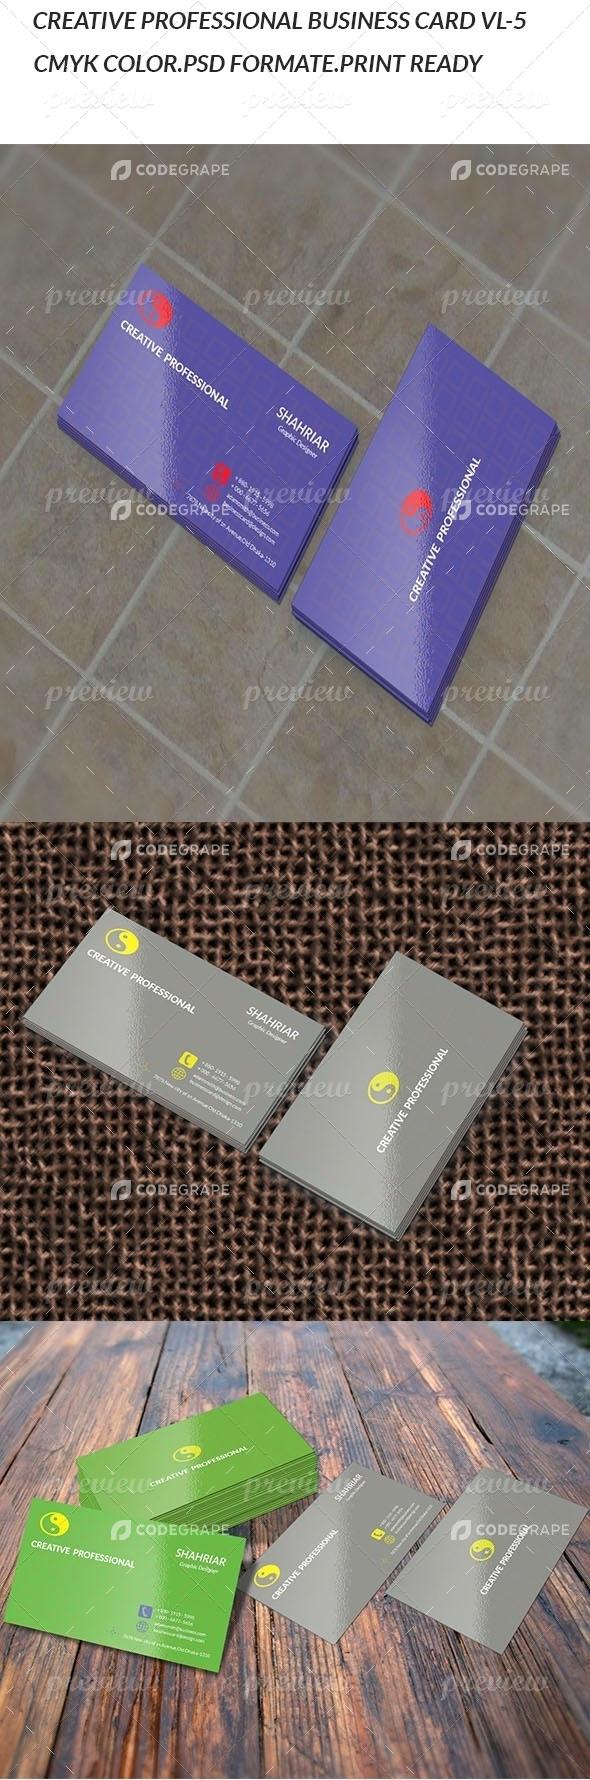 Creative Professional VL-5 Business card